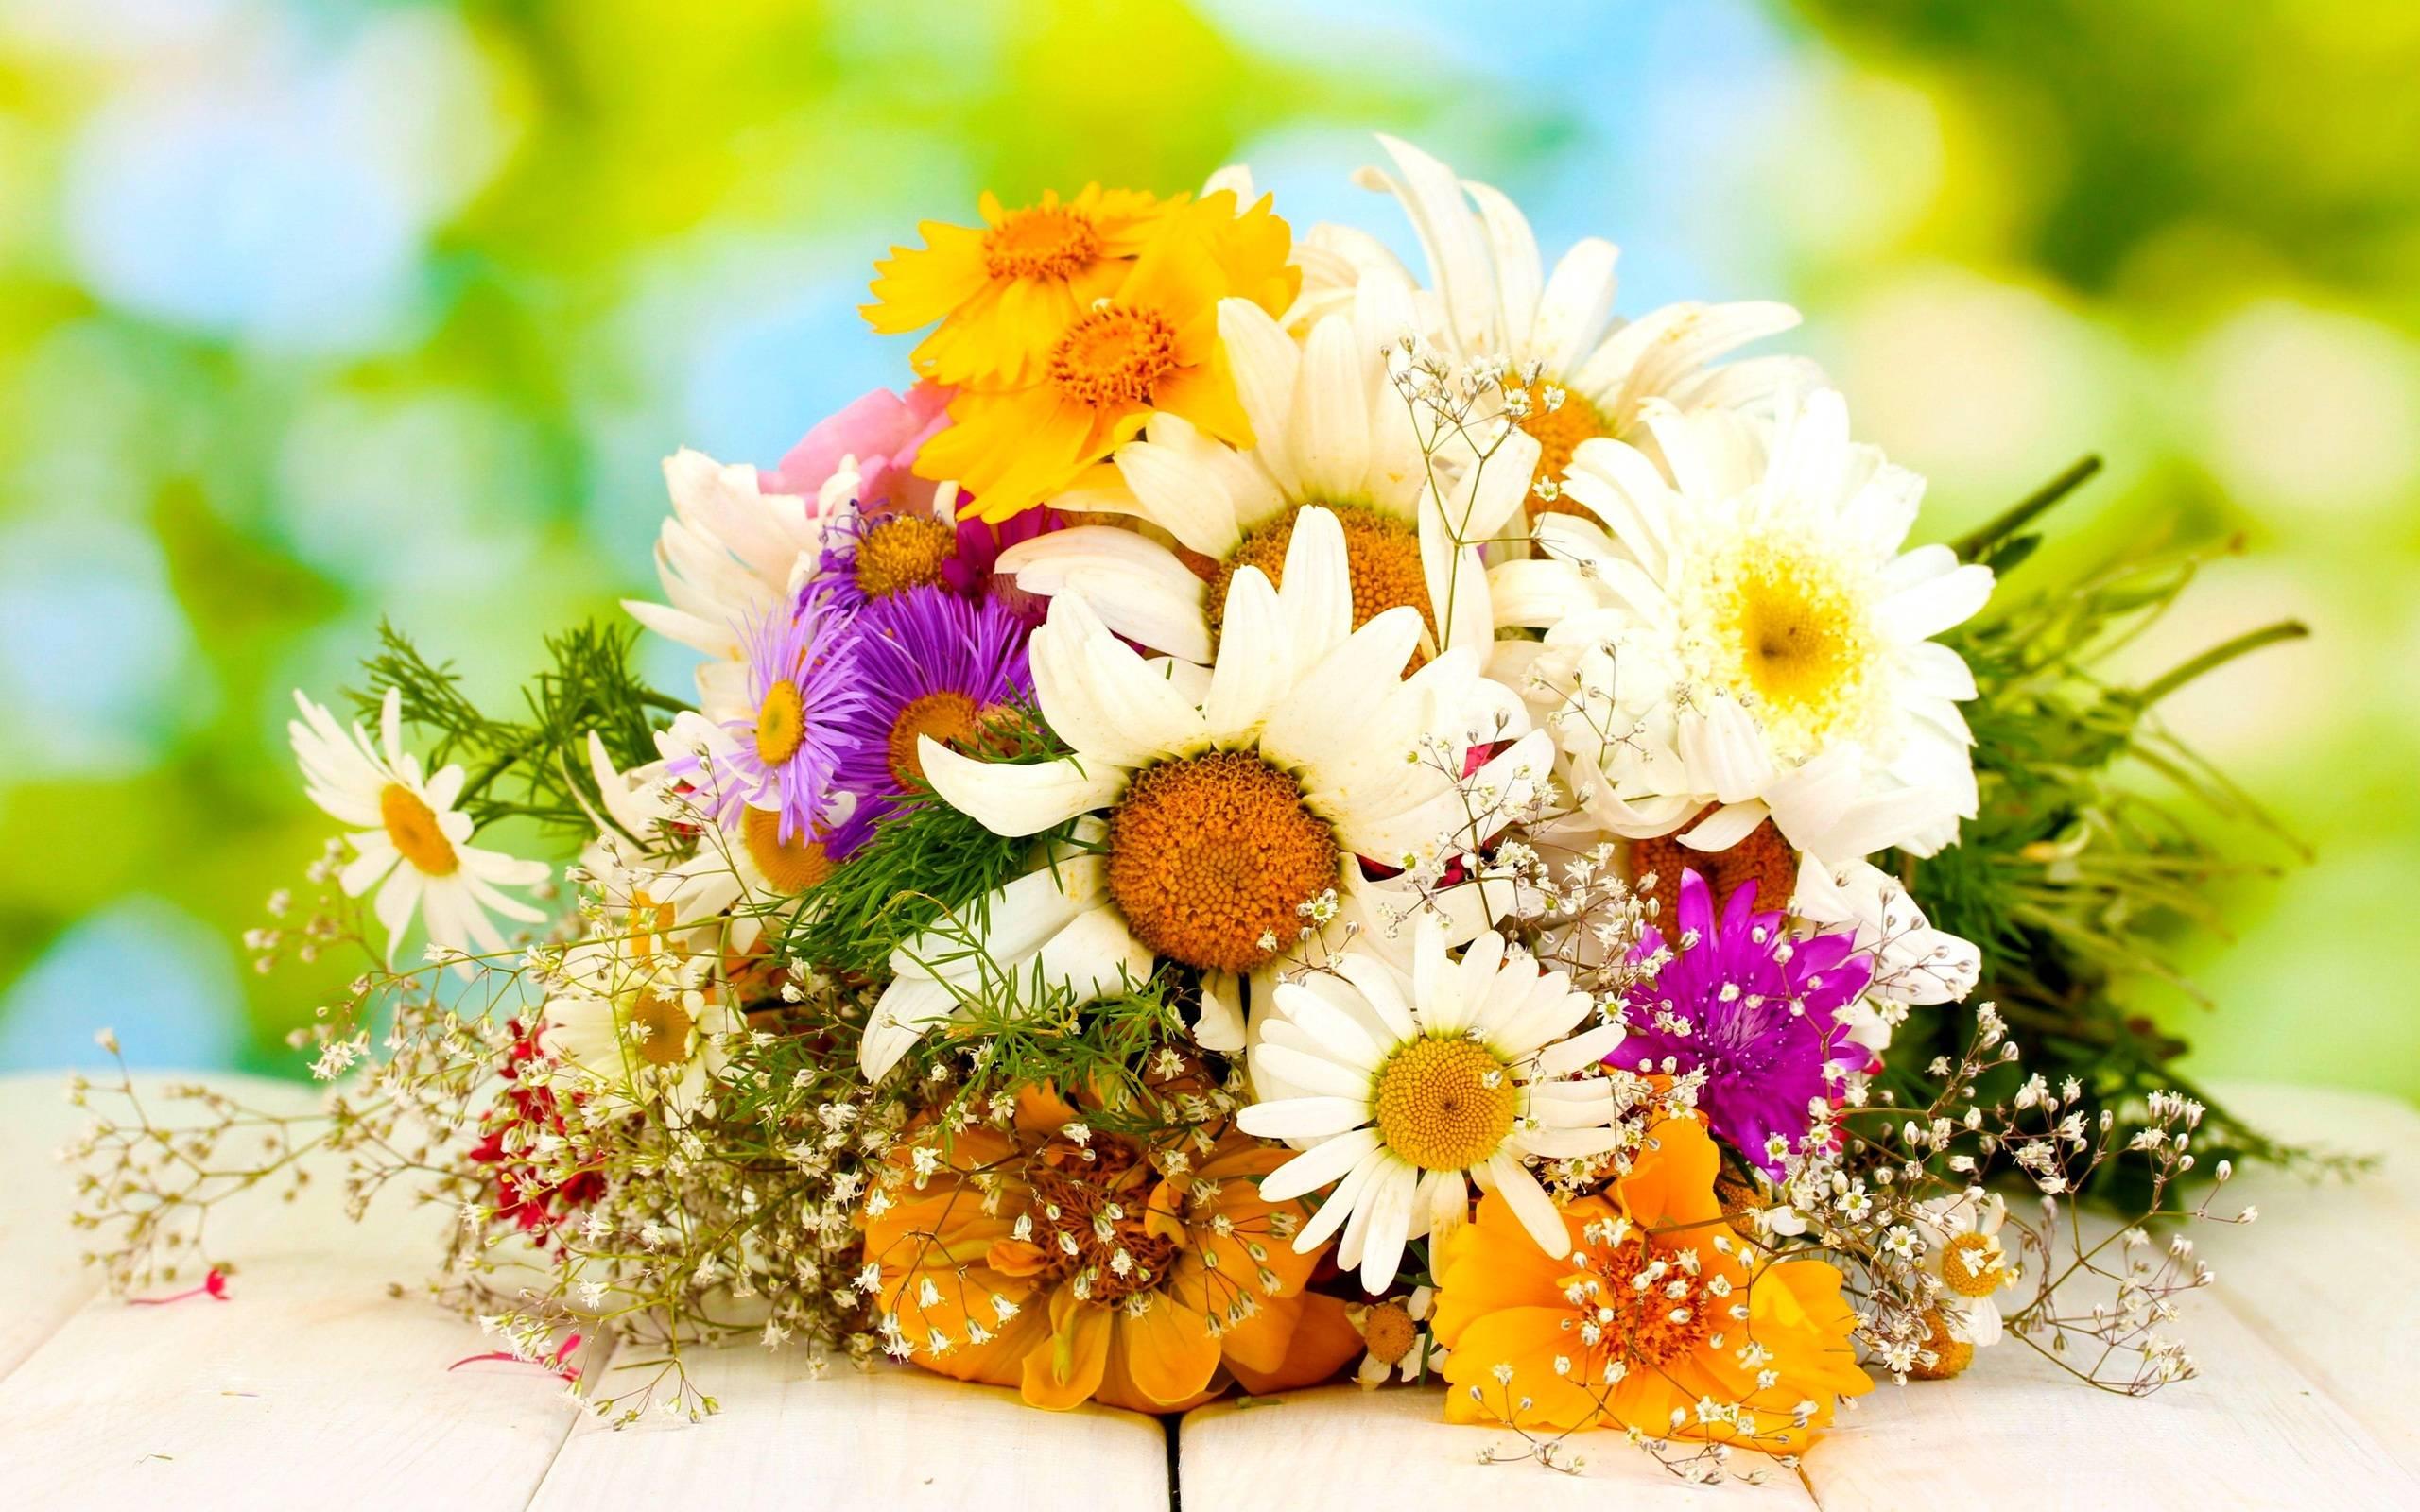 Flower Bouquet Wallpapers Wallpaper Cave